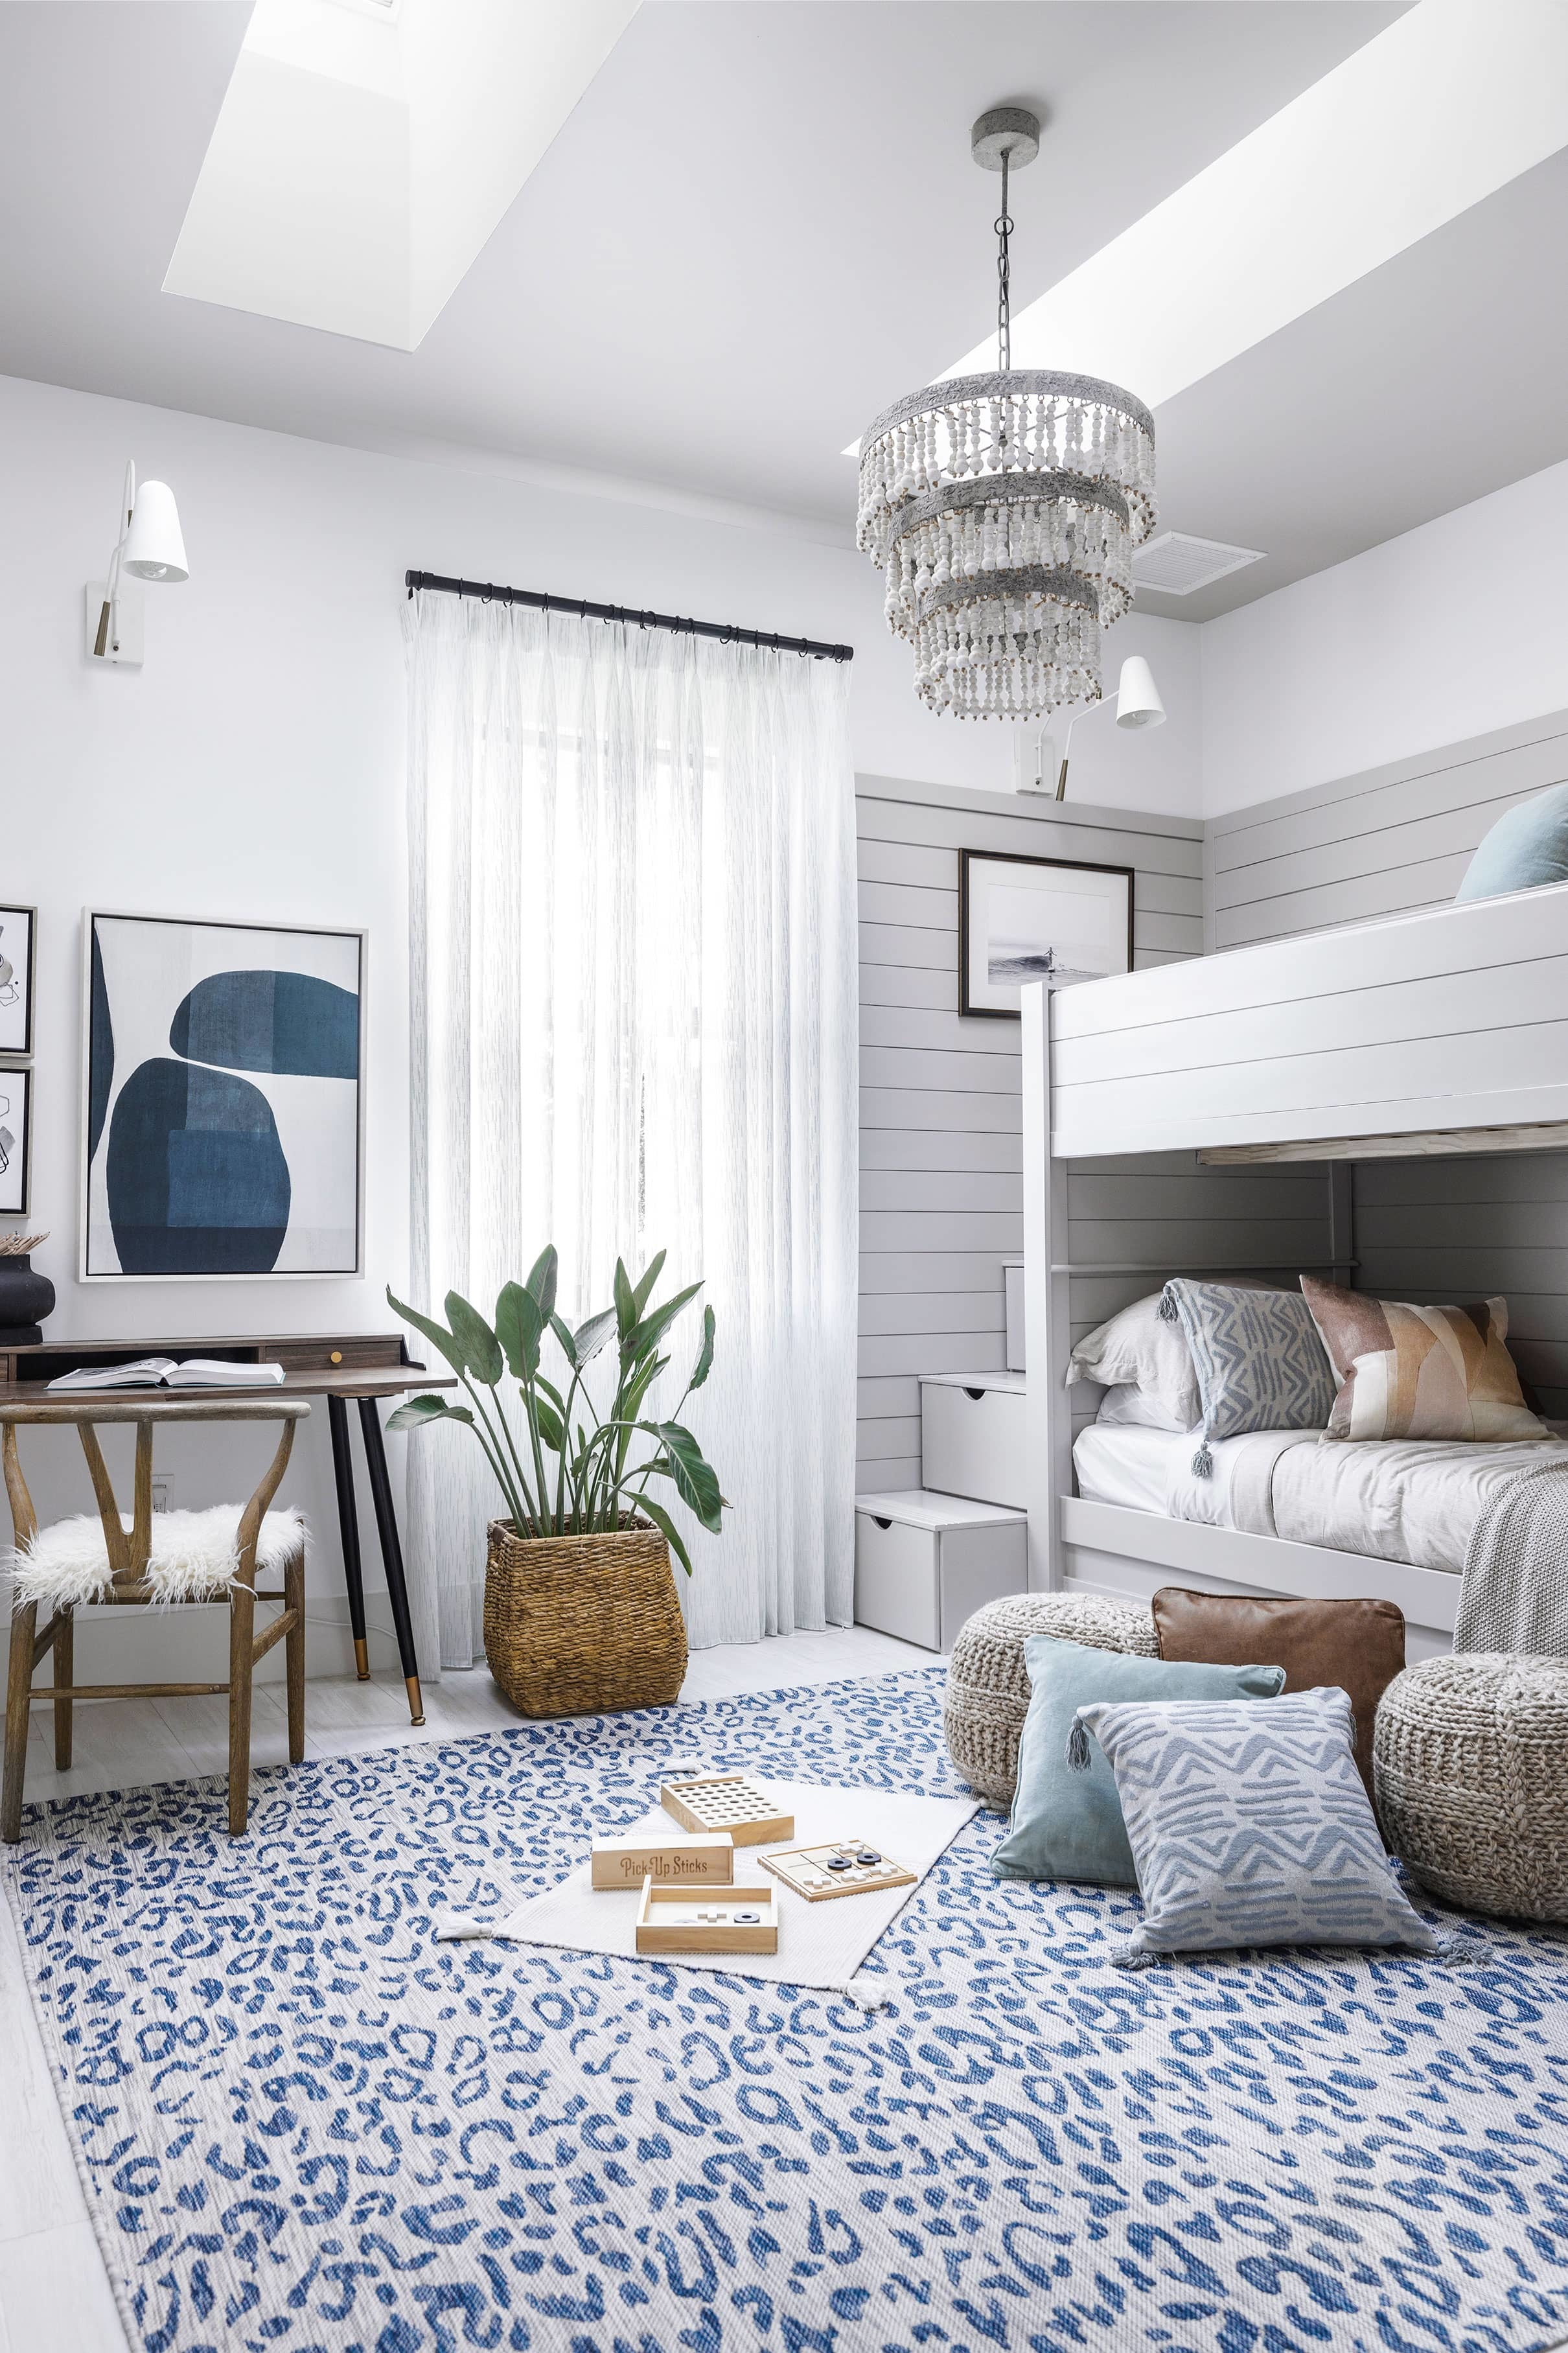 Bedroom bunk beds skylights blue white